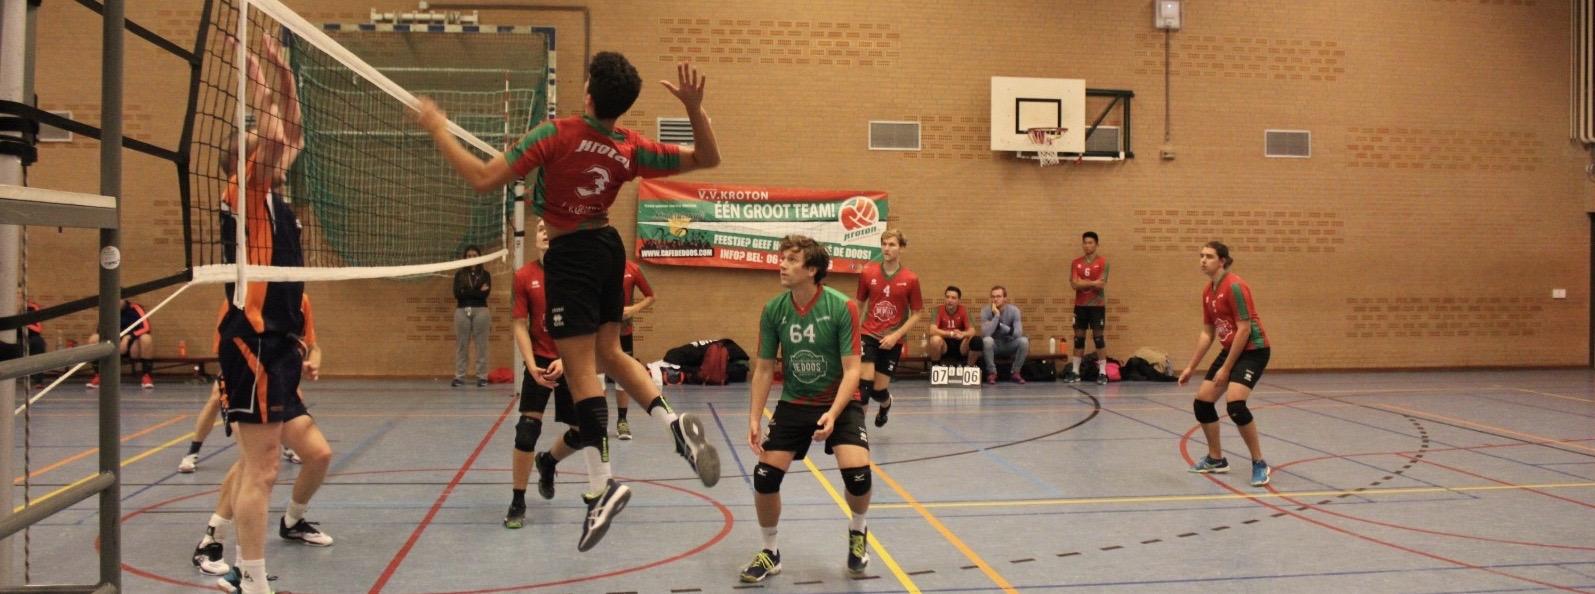 Volleyballen doe je bij V.V. Kroton!